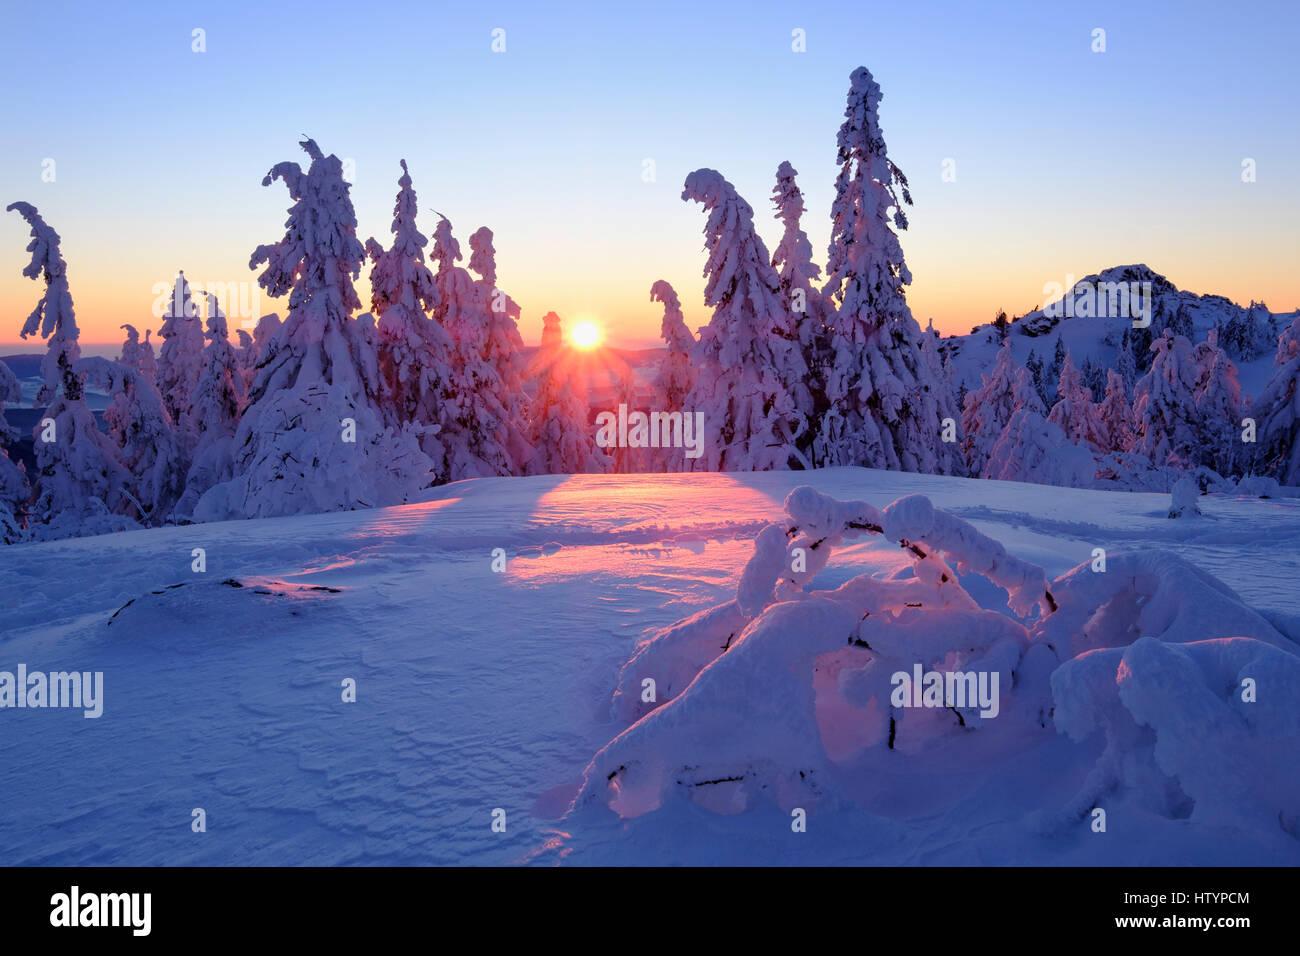 Sunset, Arbermandl, snowy spruces, Arber, Natural Preserve Bavarian Forest, Lower Bavaria, Bavaria, Germany - Stock Image